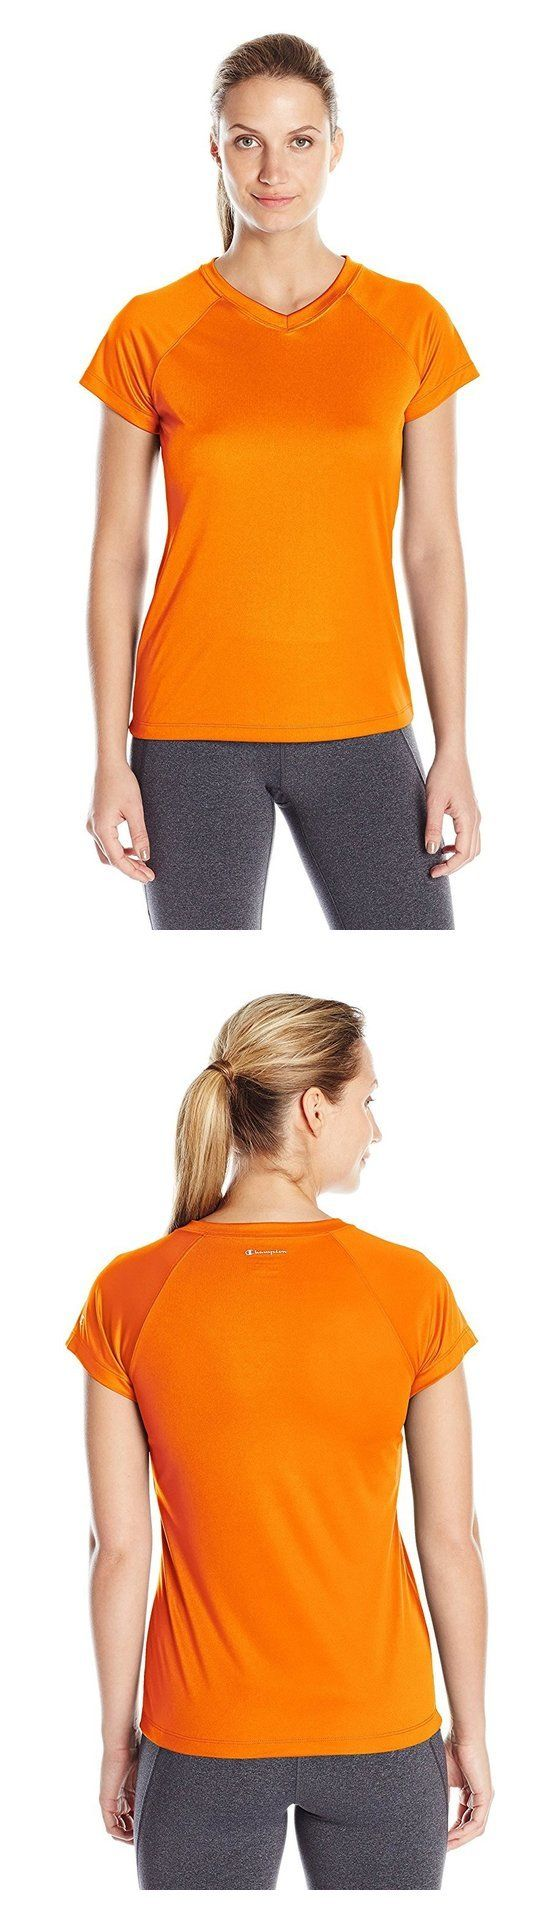 7270259b2 Champion Womens Authentic Jersey Short Sleeve V Neck T Shirt